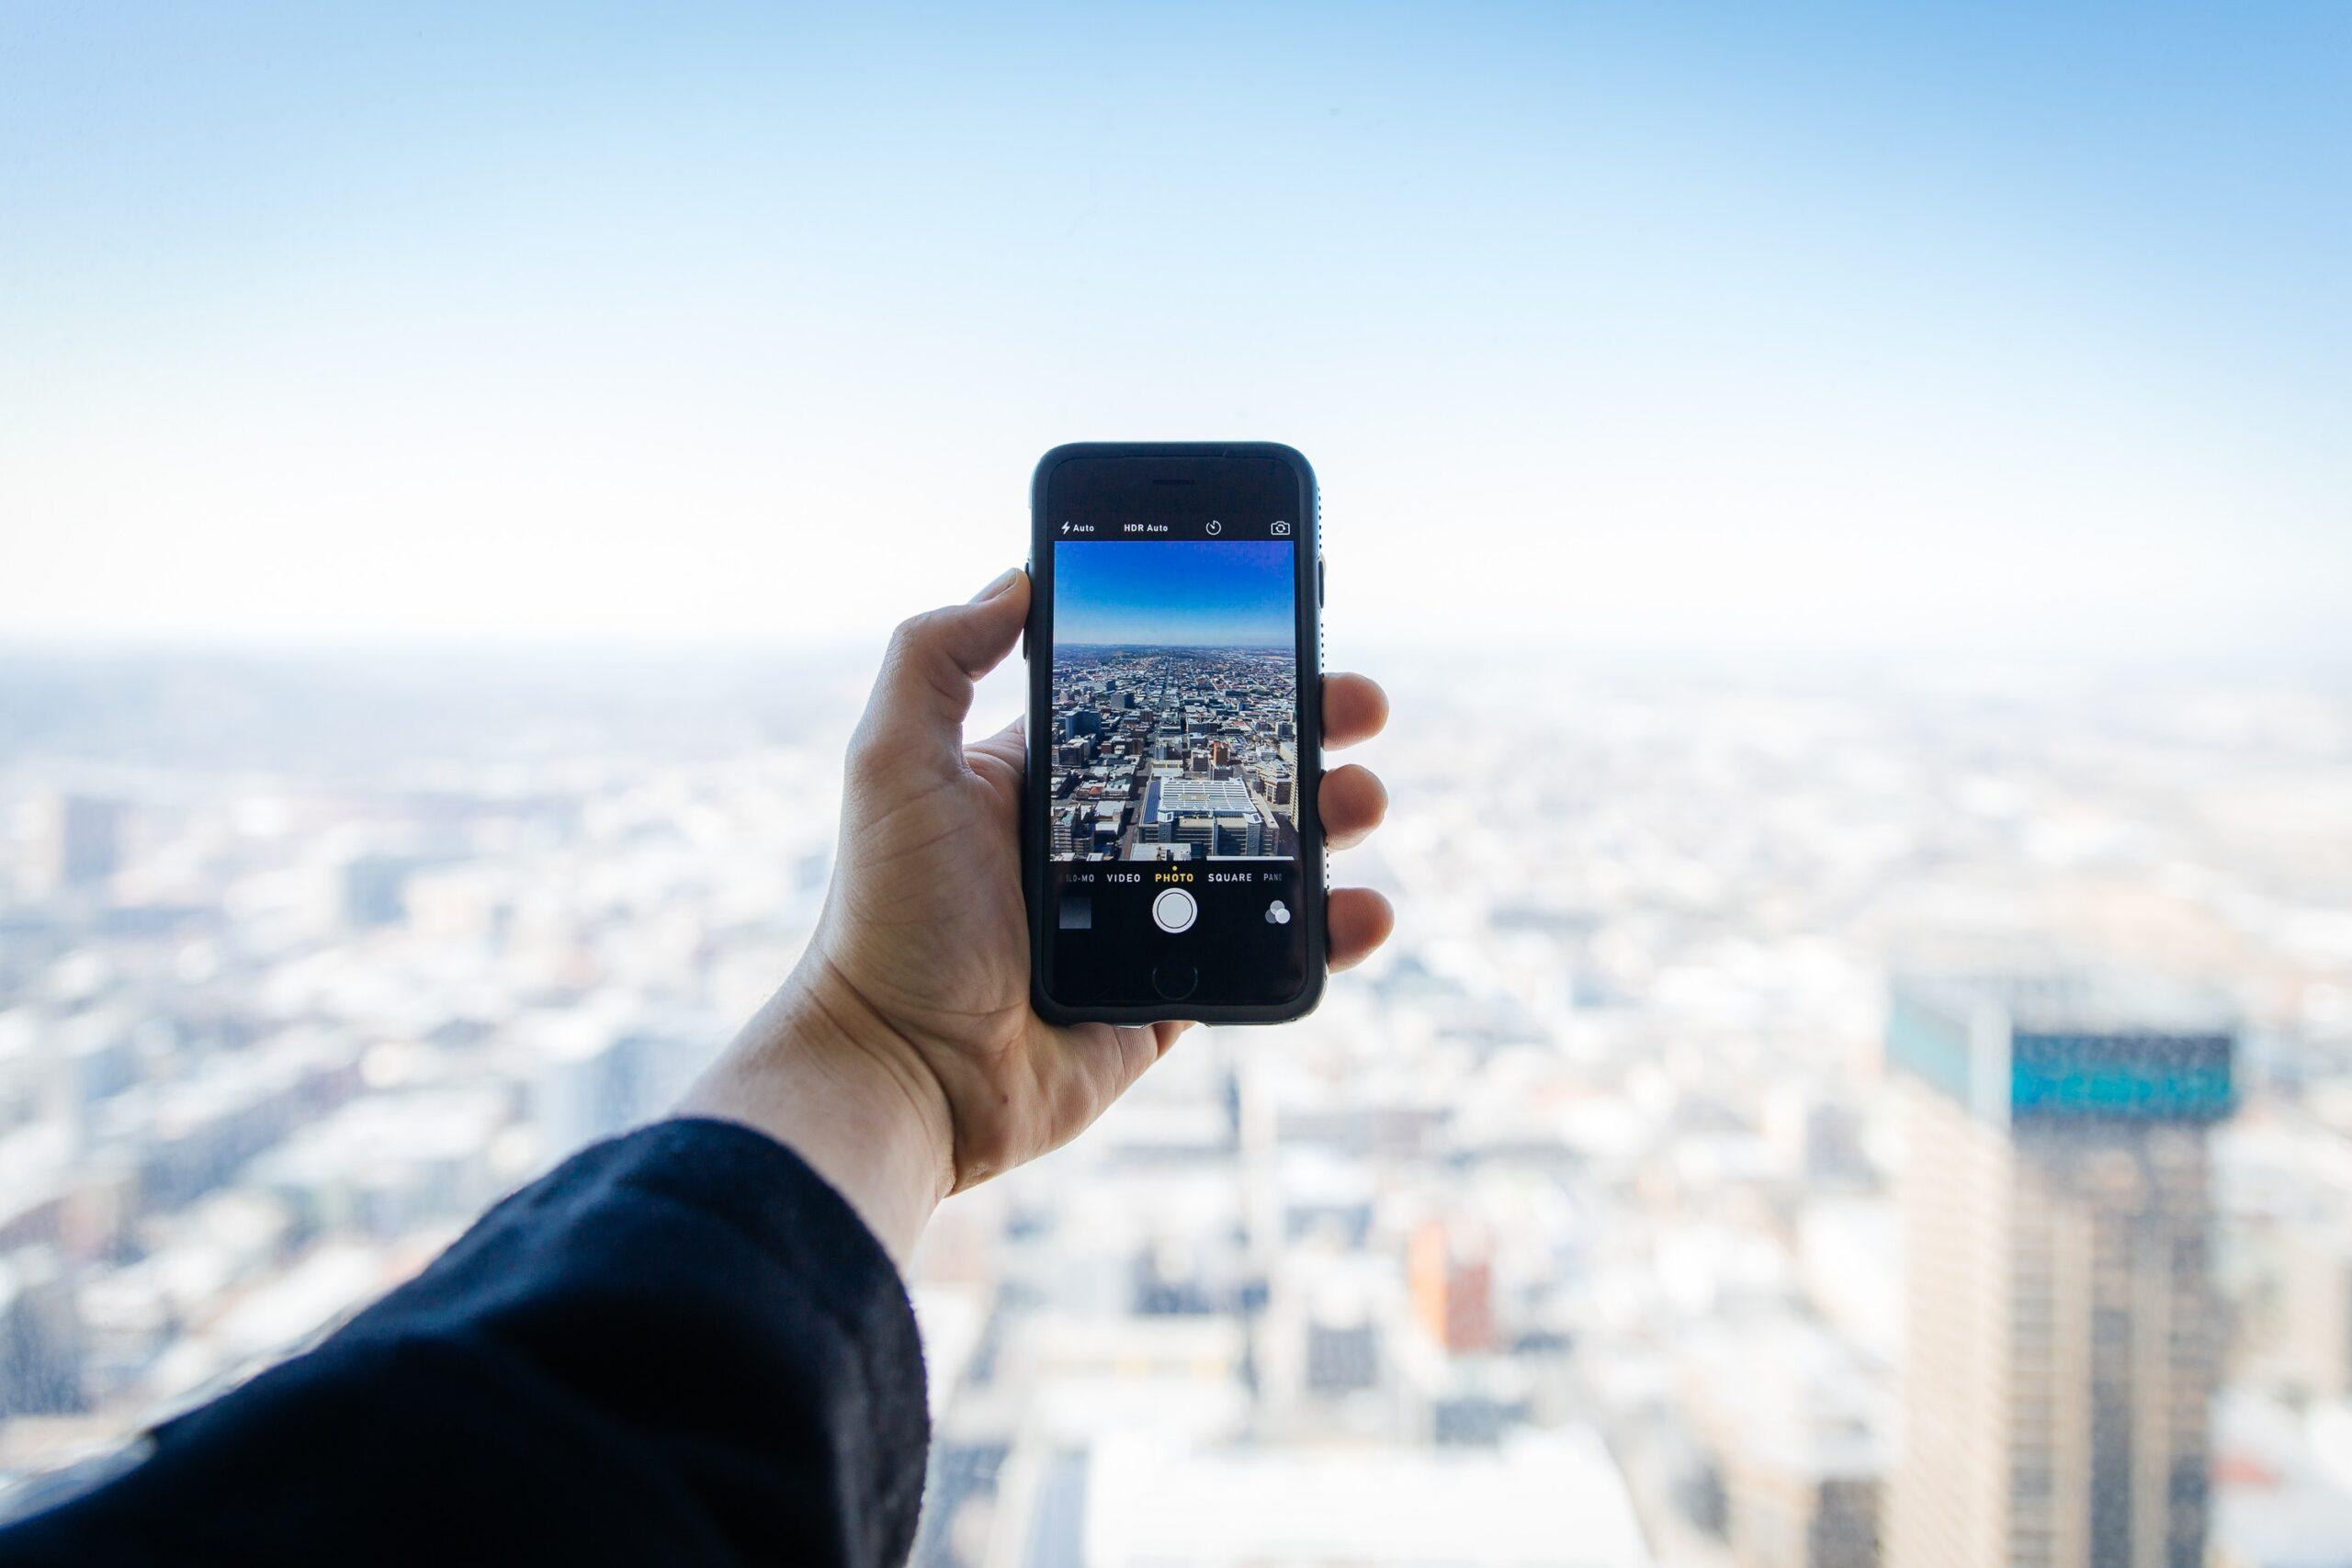 landscape-street-rooftop-iphone